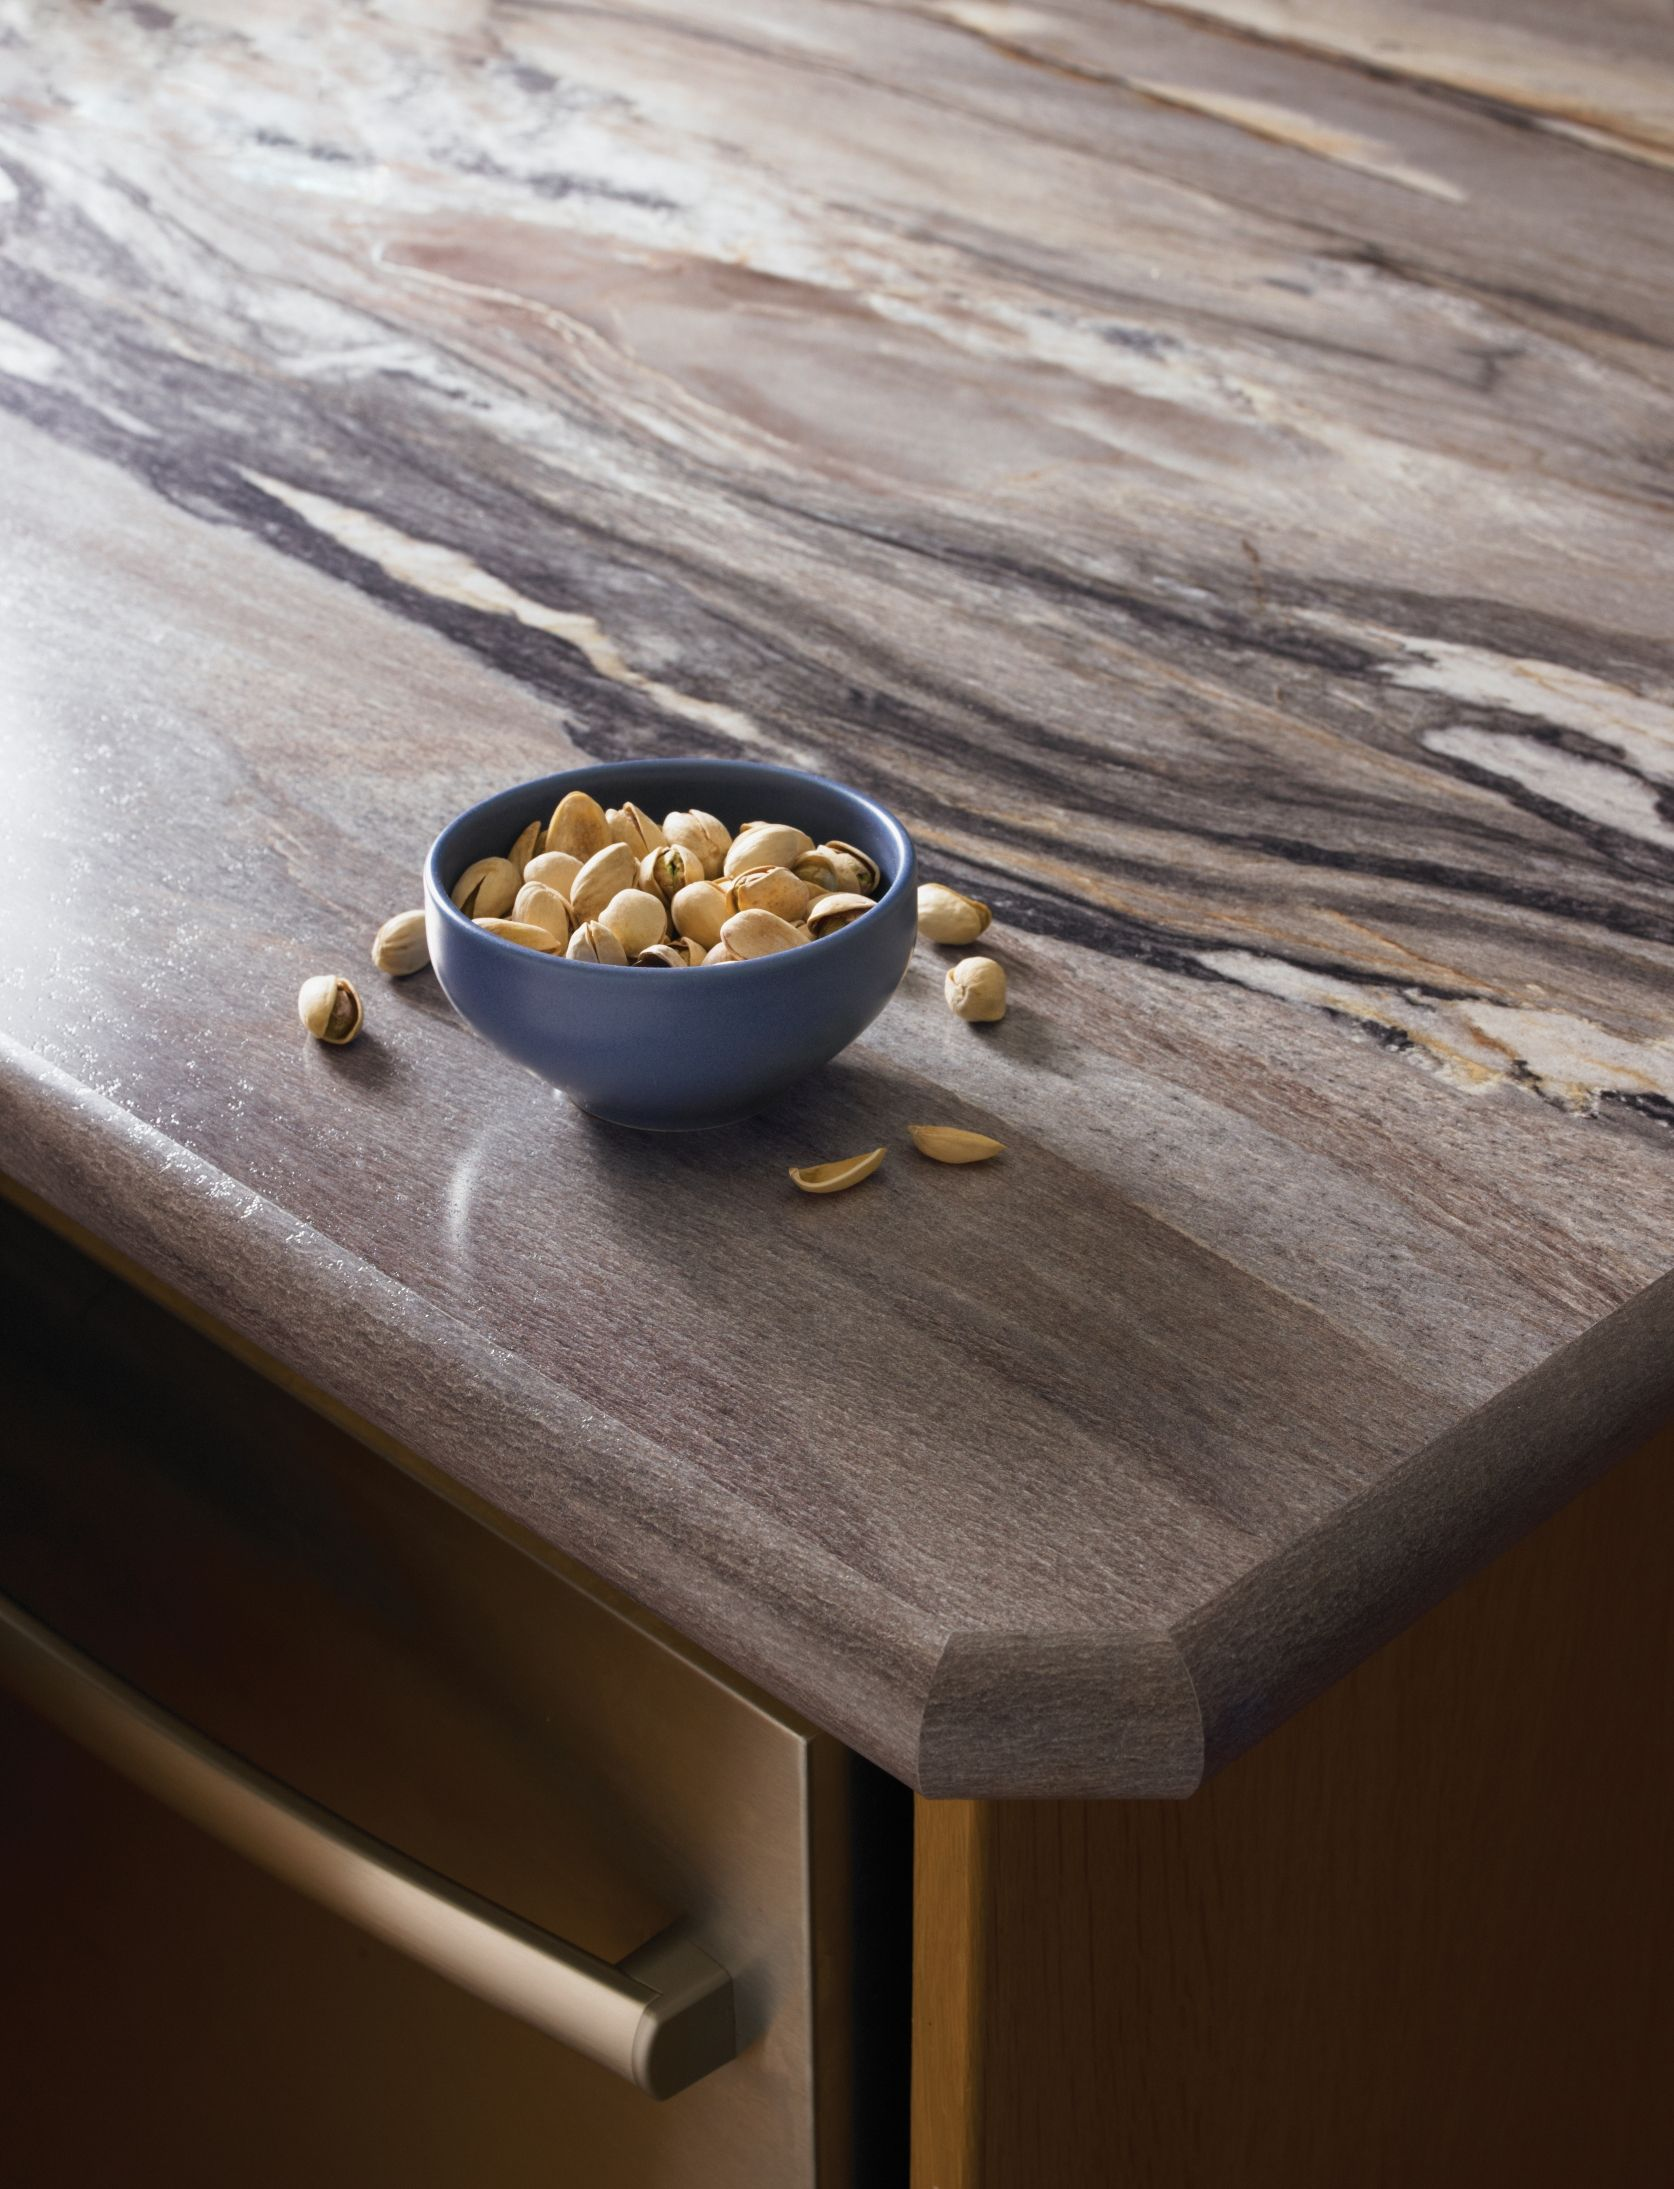 NEW for 2012: 3420 - Dolce Vita #Bullnose #Kitchen #Countertop ...